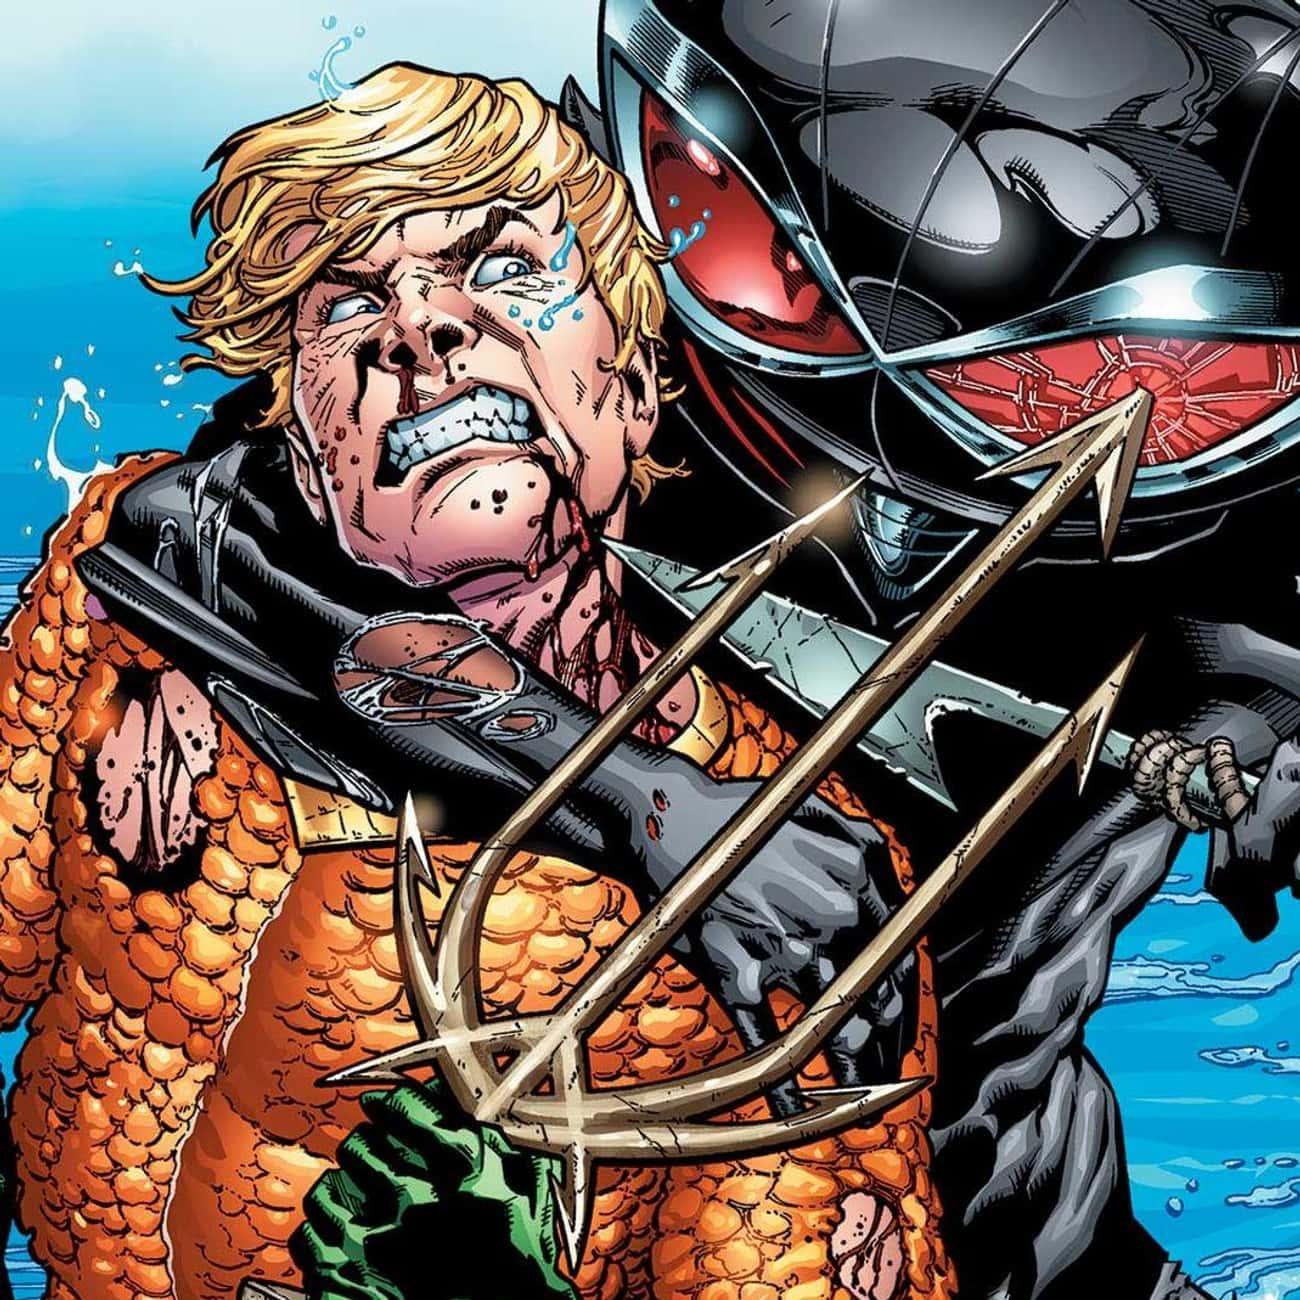 Aquaman is listed (or ranked) 4 on the list Half-Human Hybrid Heroes